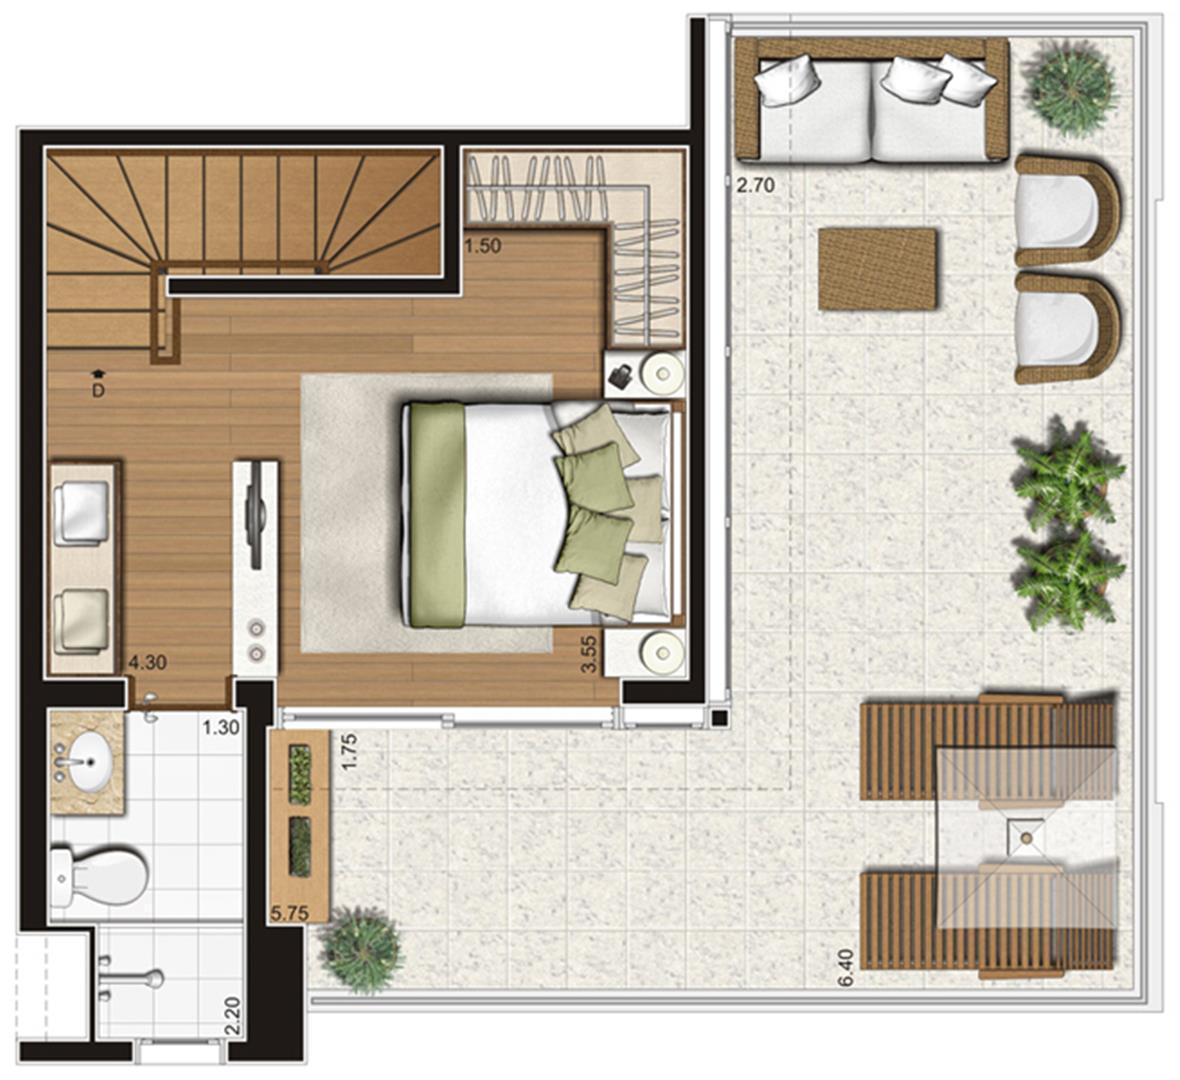 Planta-tipo do pavimento superior do apartamento duplex de 95 m² privativos, finais 5 e 10 | Tempo Bello – Apartamento no  Campo Belo - São Paulo - São Paulo